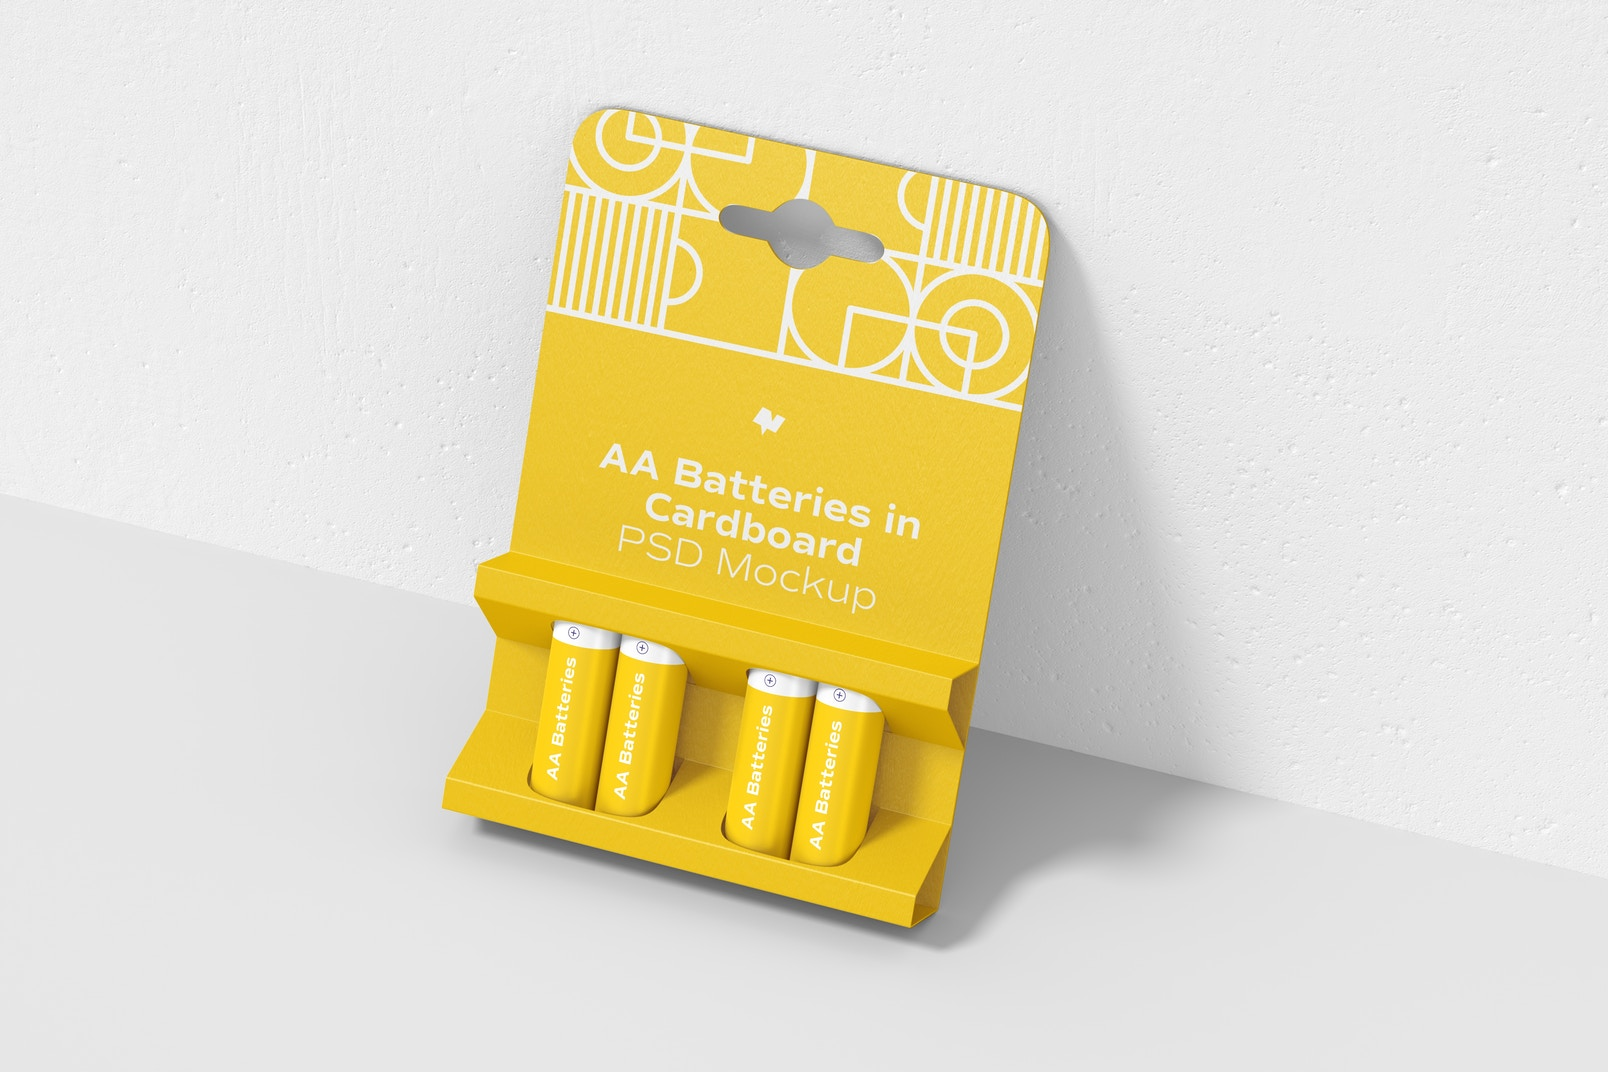 AA Batteries in Cardboard Mockup, Leaned